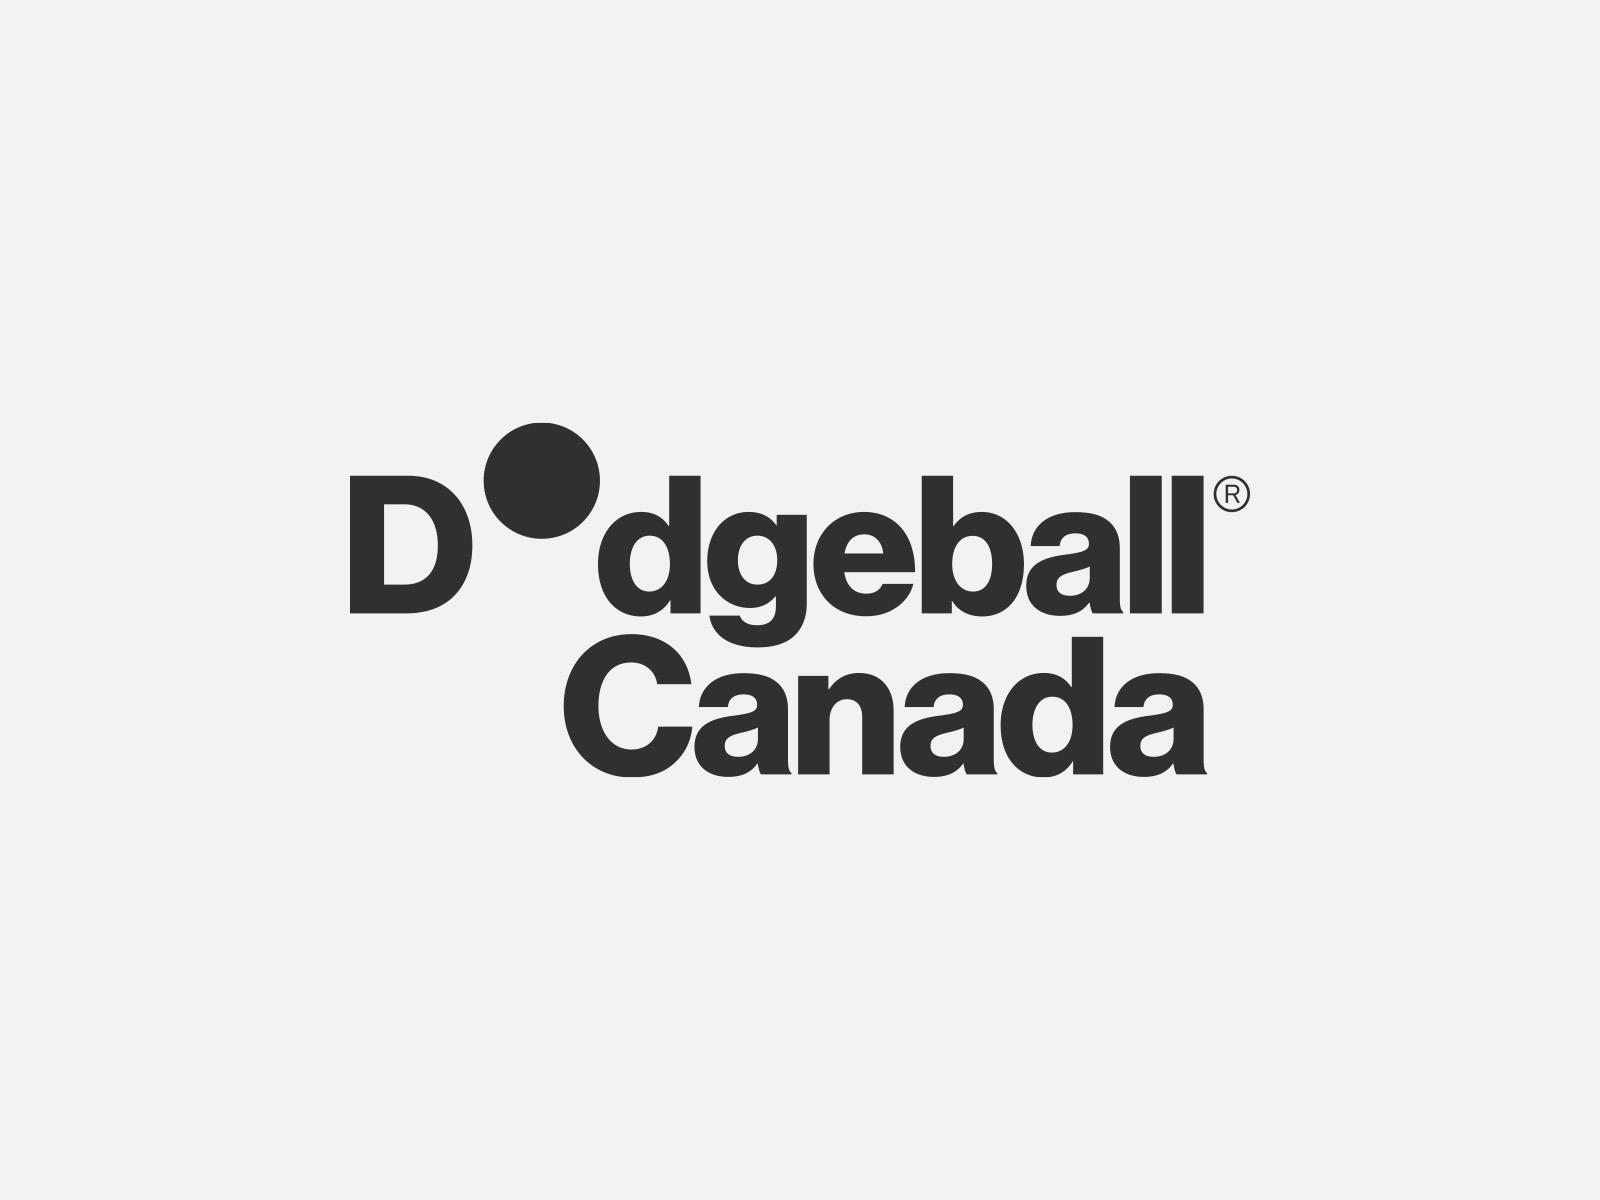 Dodgeball Canada by Leo Burnett Design